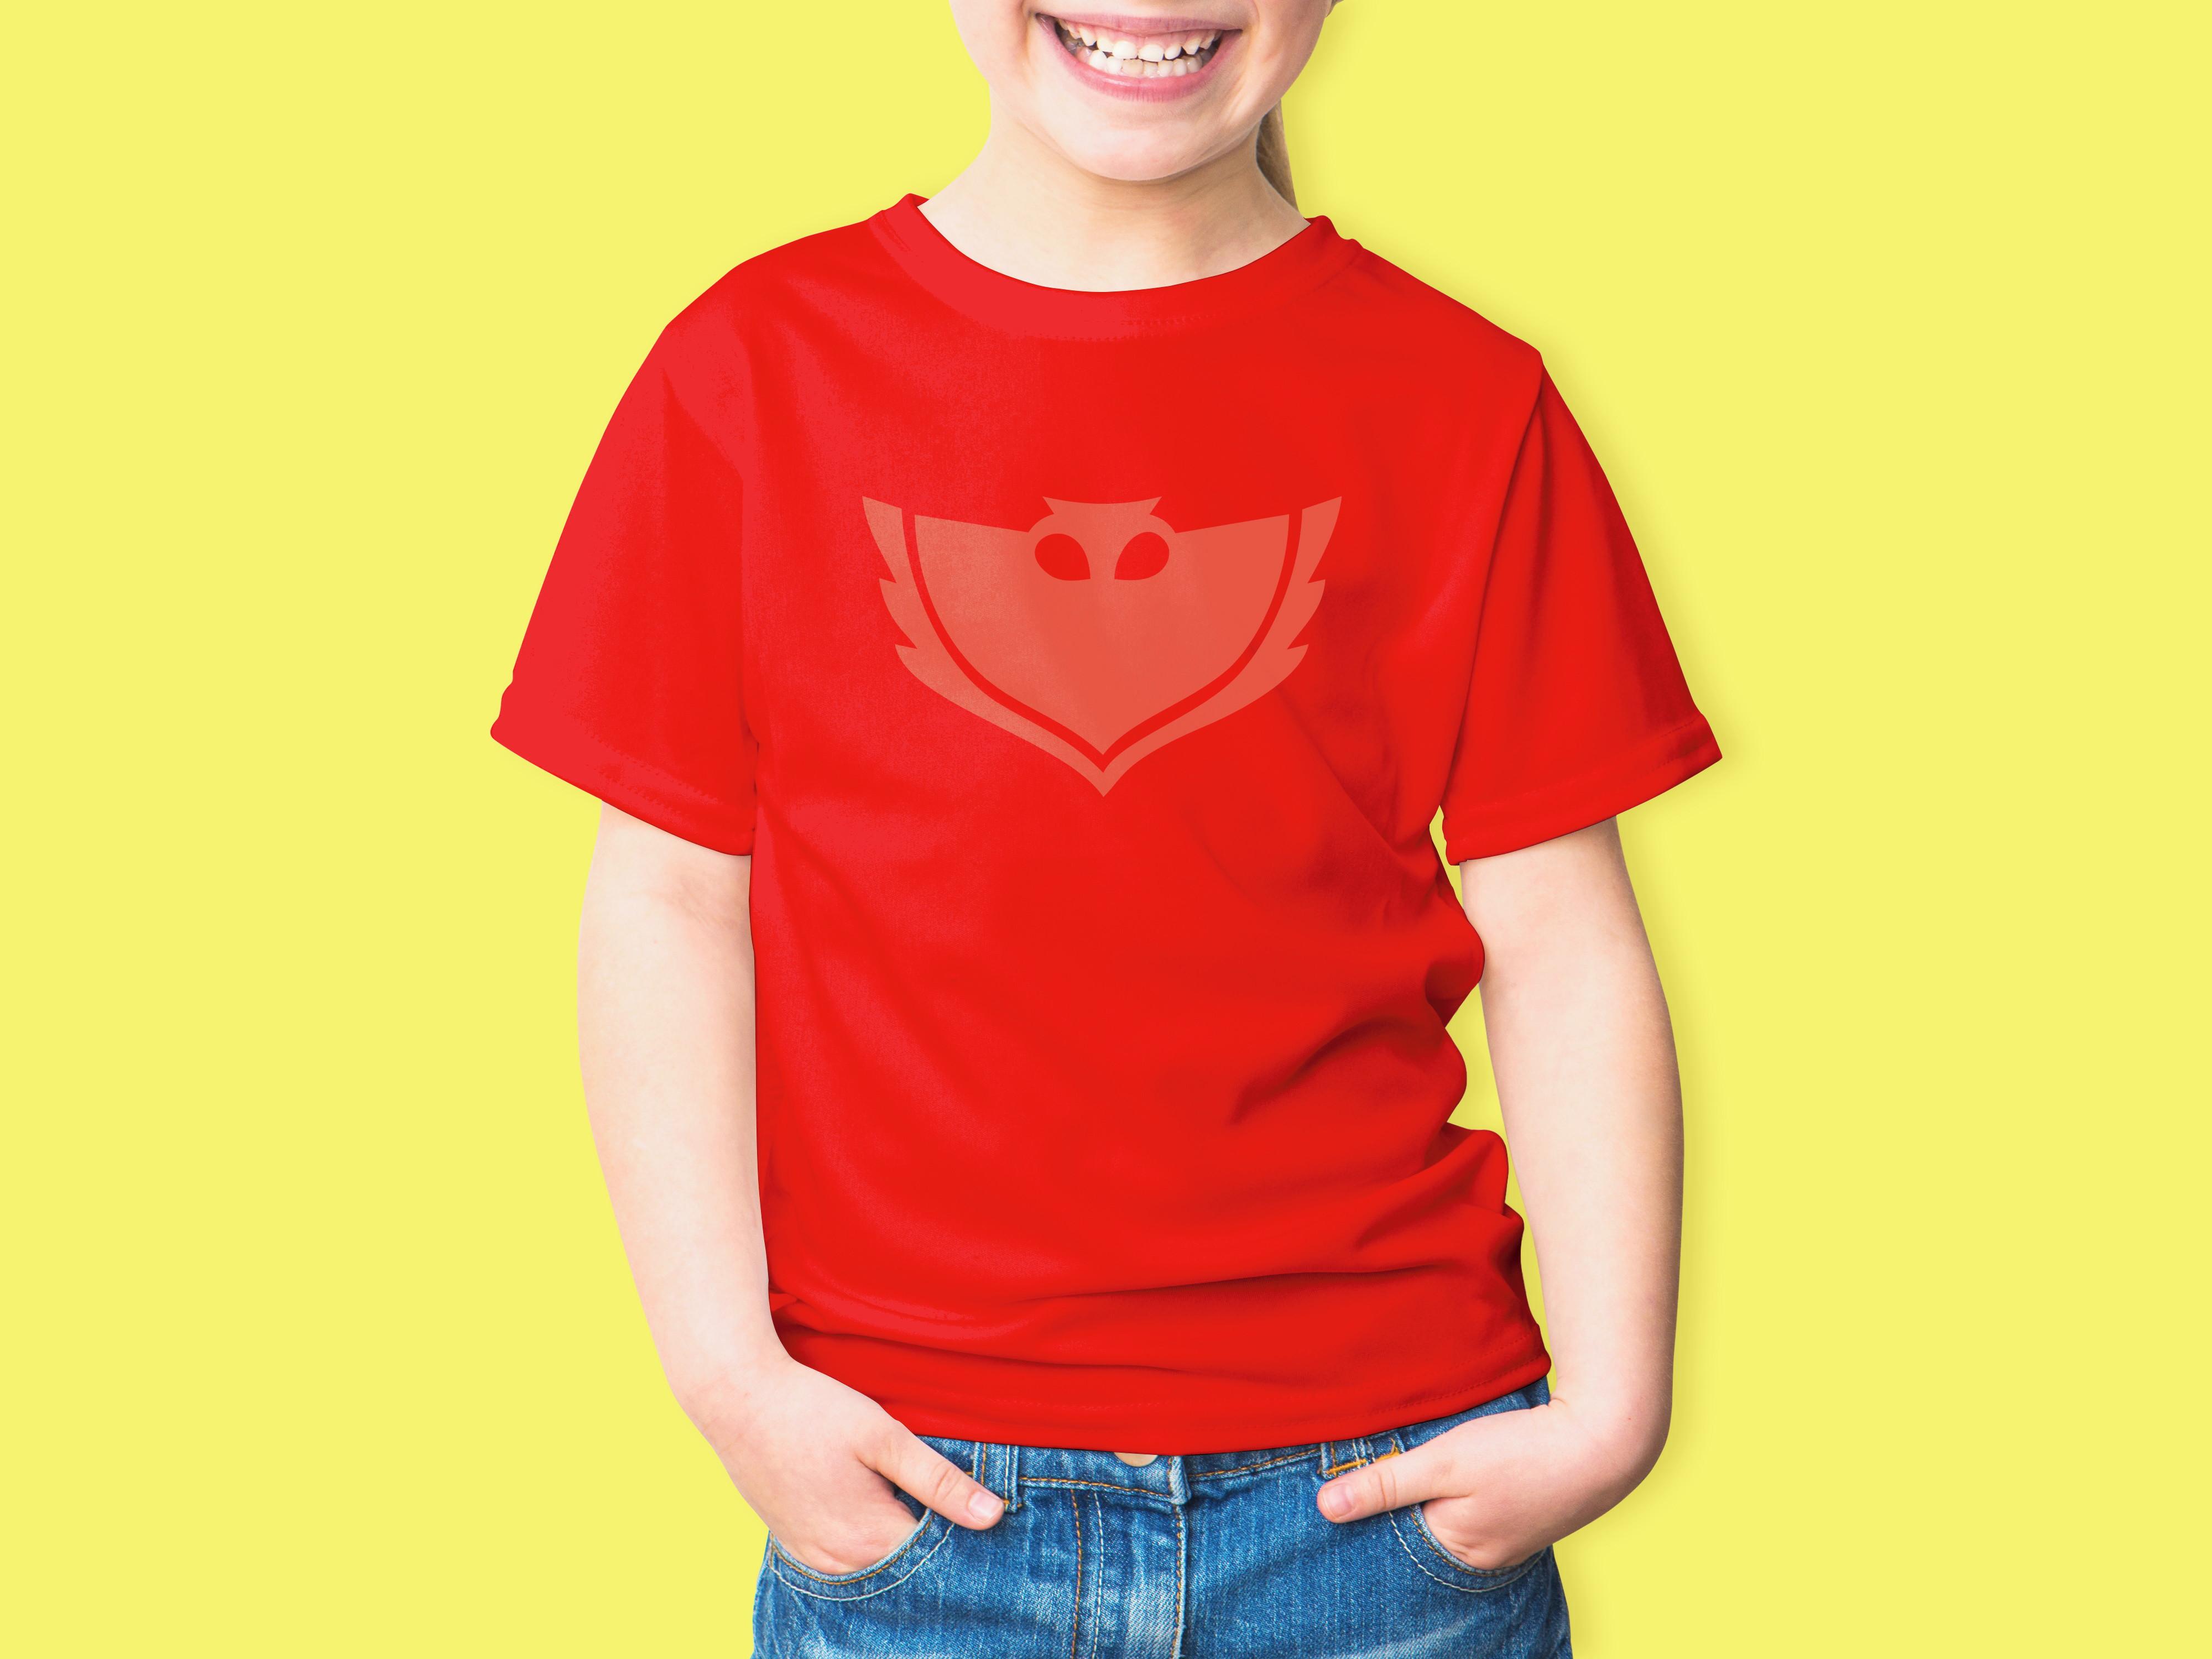 5db87f171 Camiseta Infantil Bordada Tam 6